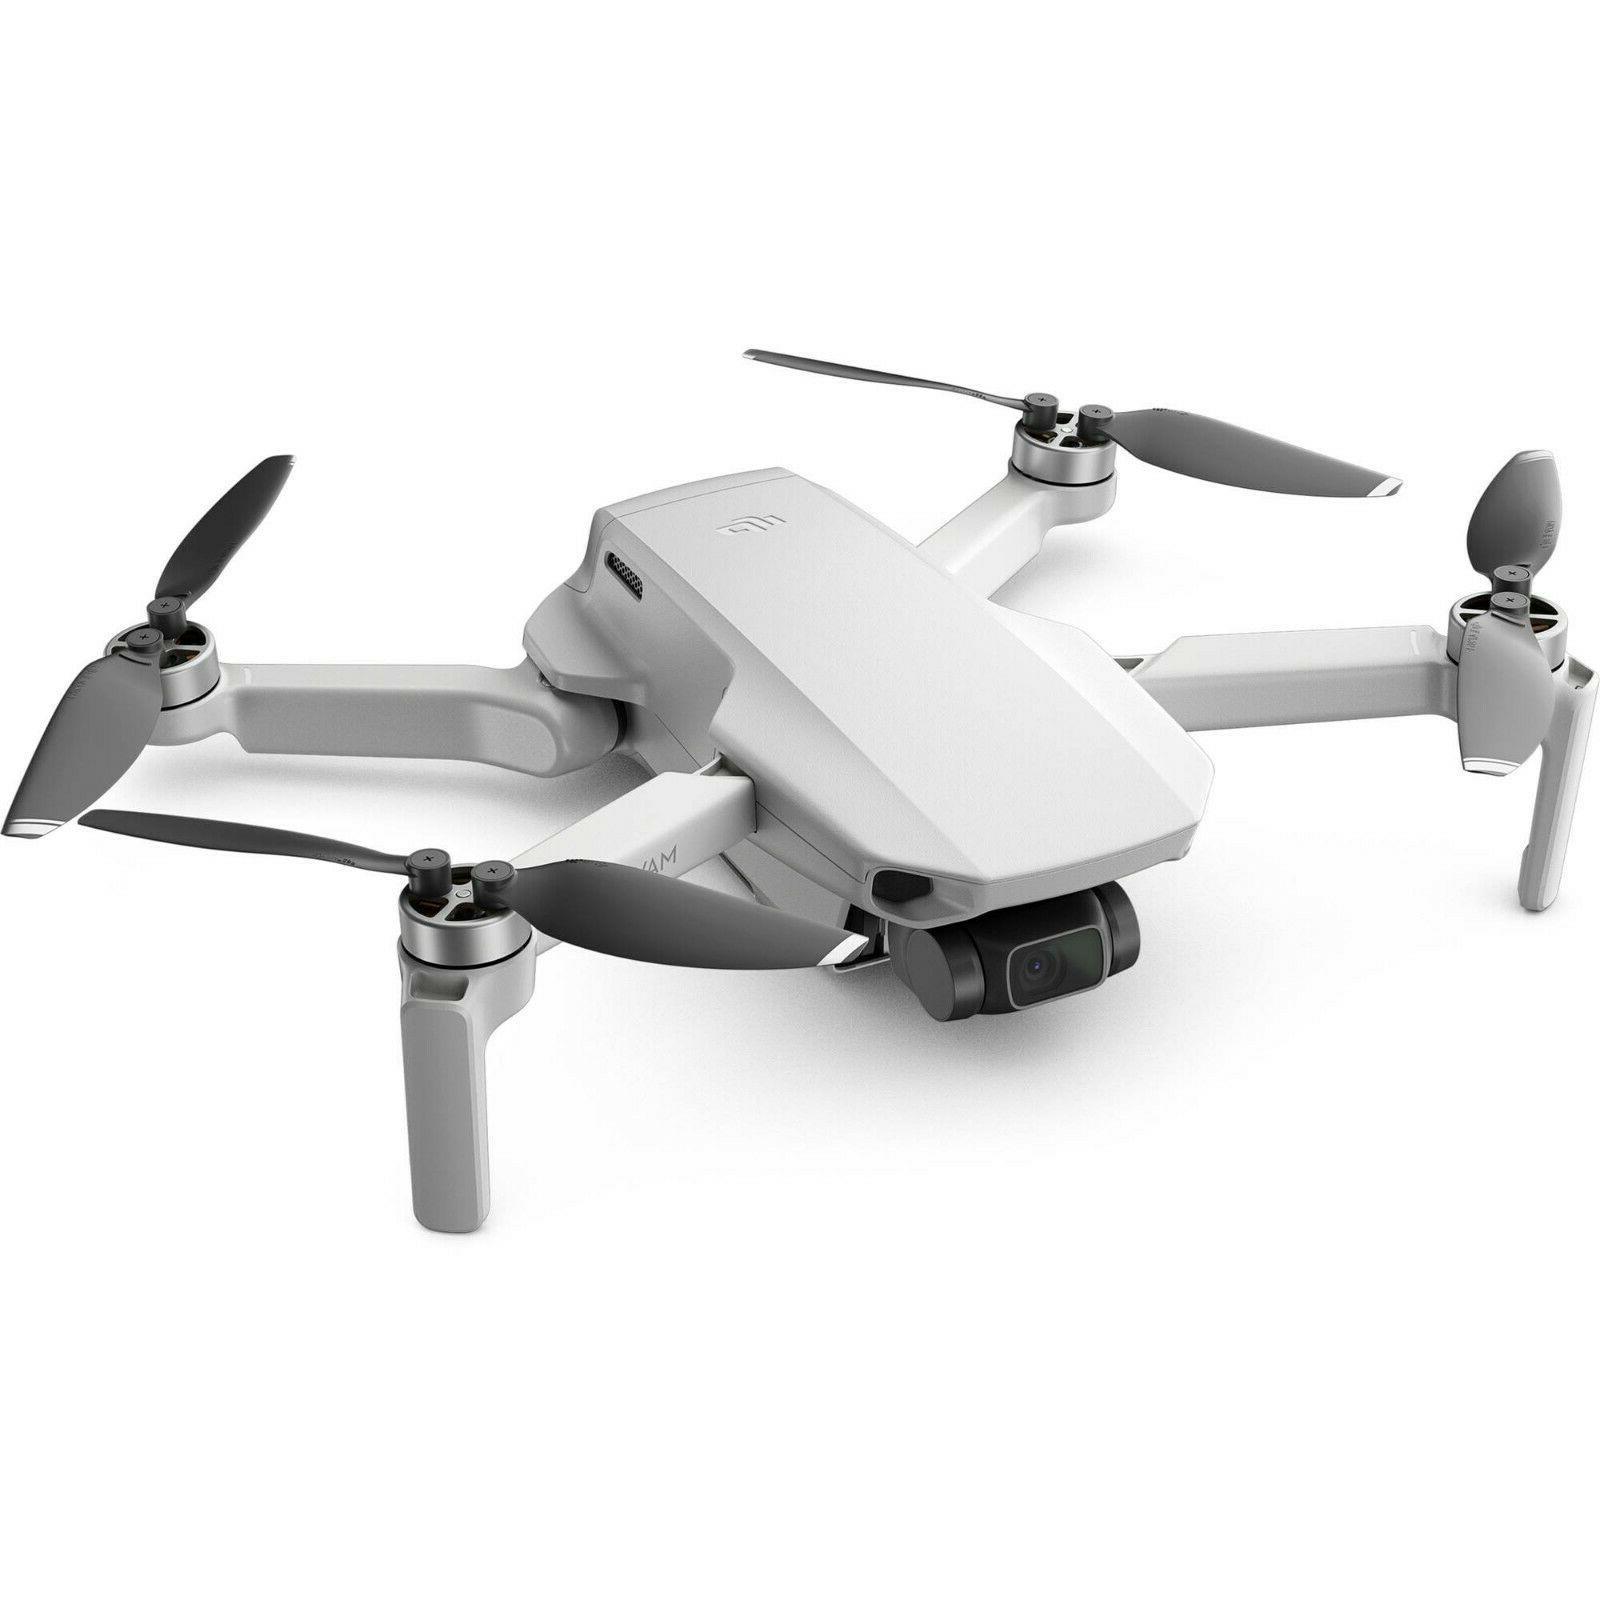 DJI Mavic Portable Drone Quadcopter Kit